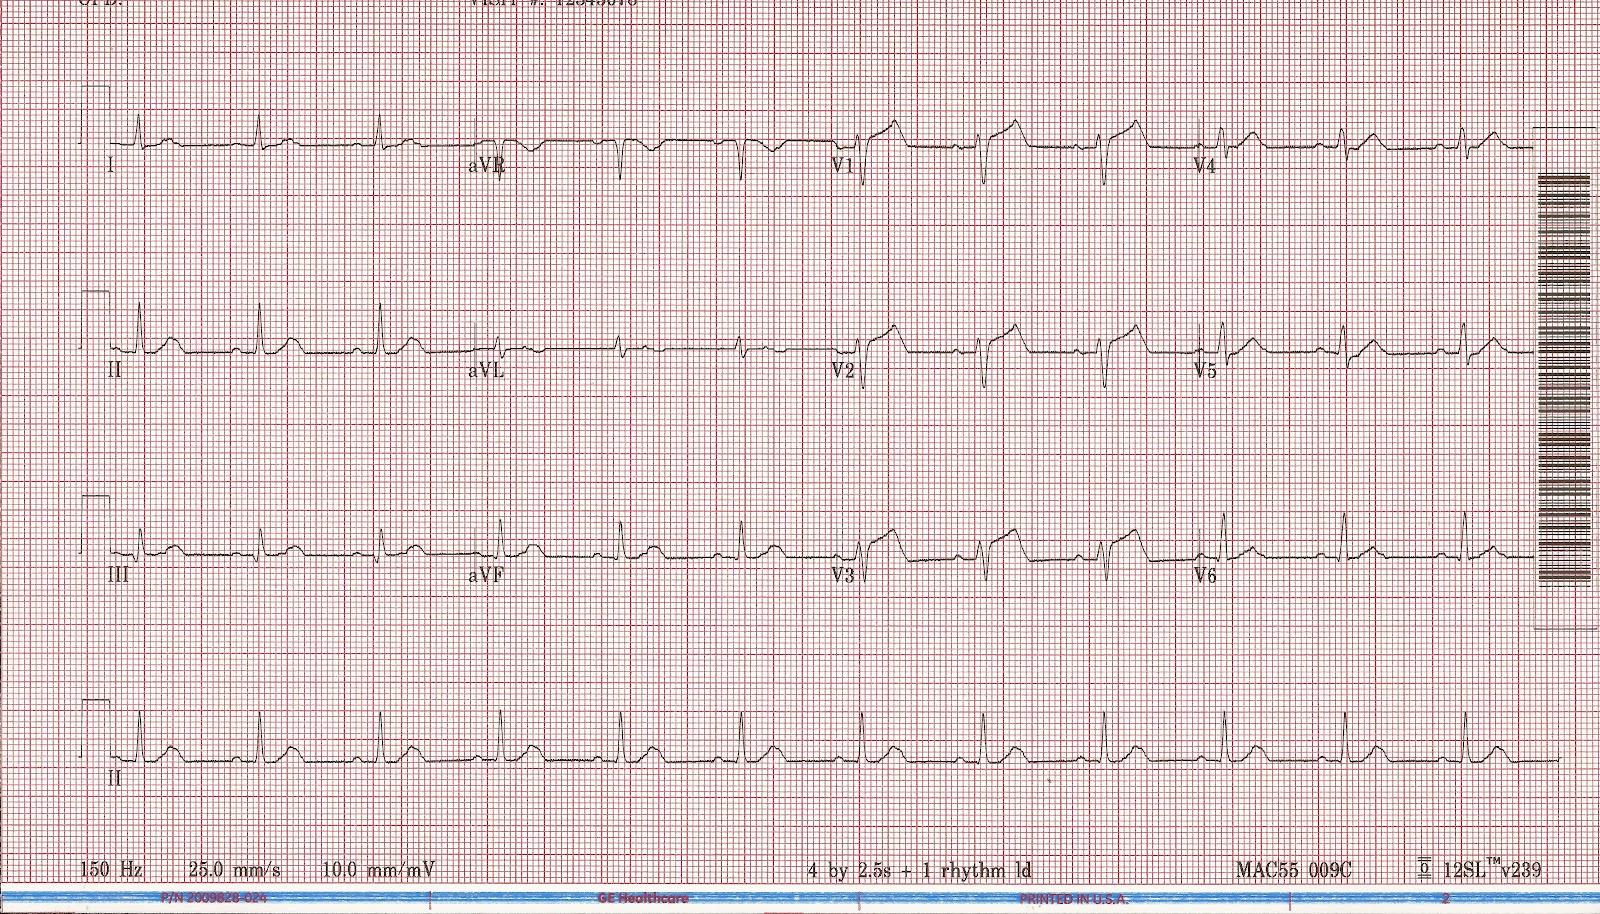 Float Nurse Megacode Unstable Ventricular Tachycardia Part 6